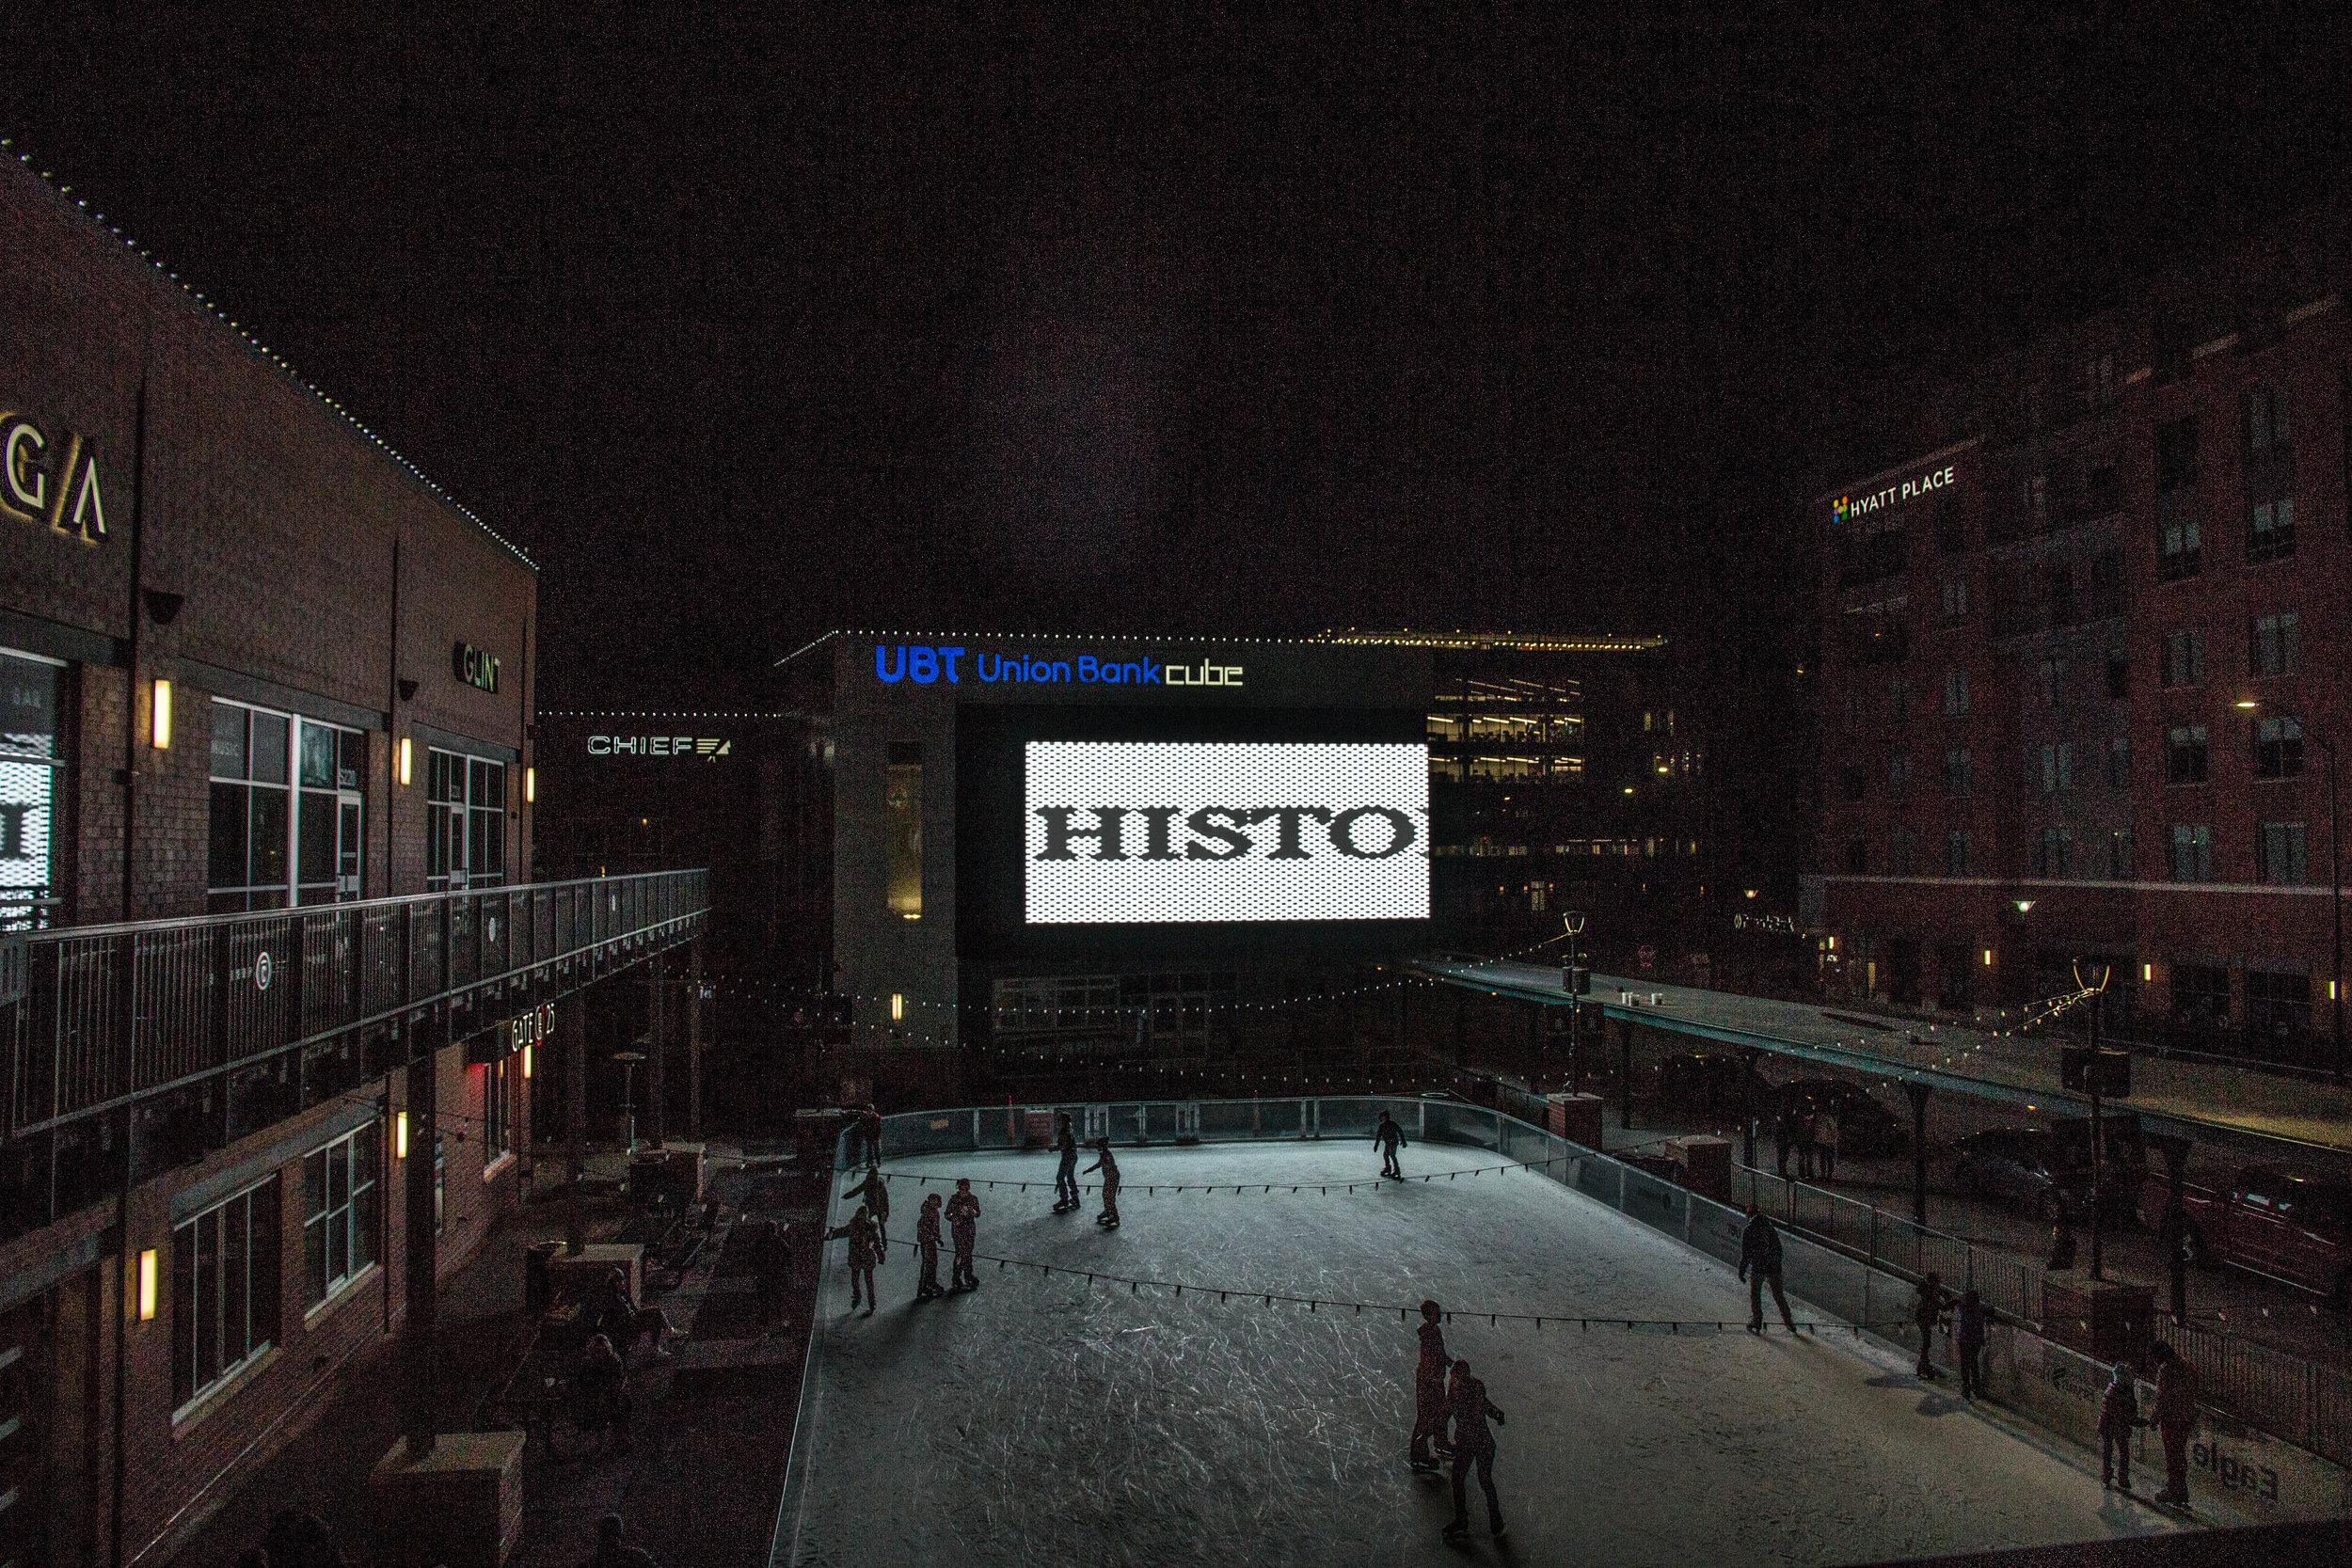 HISTORY public art video installation at The Cube Art Project (venue photo).